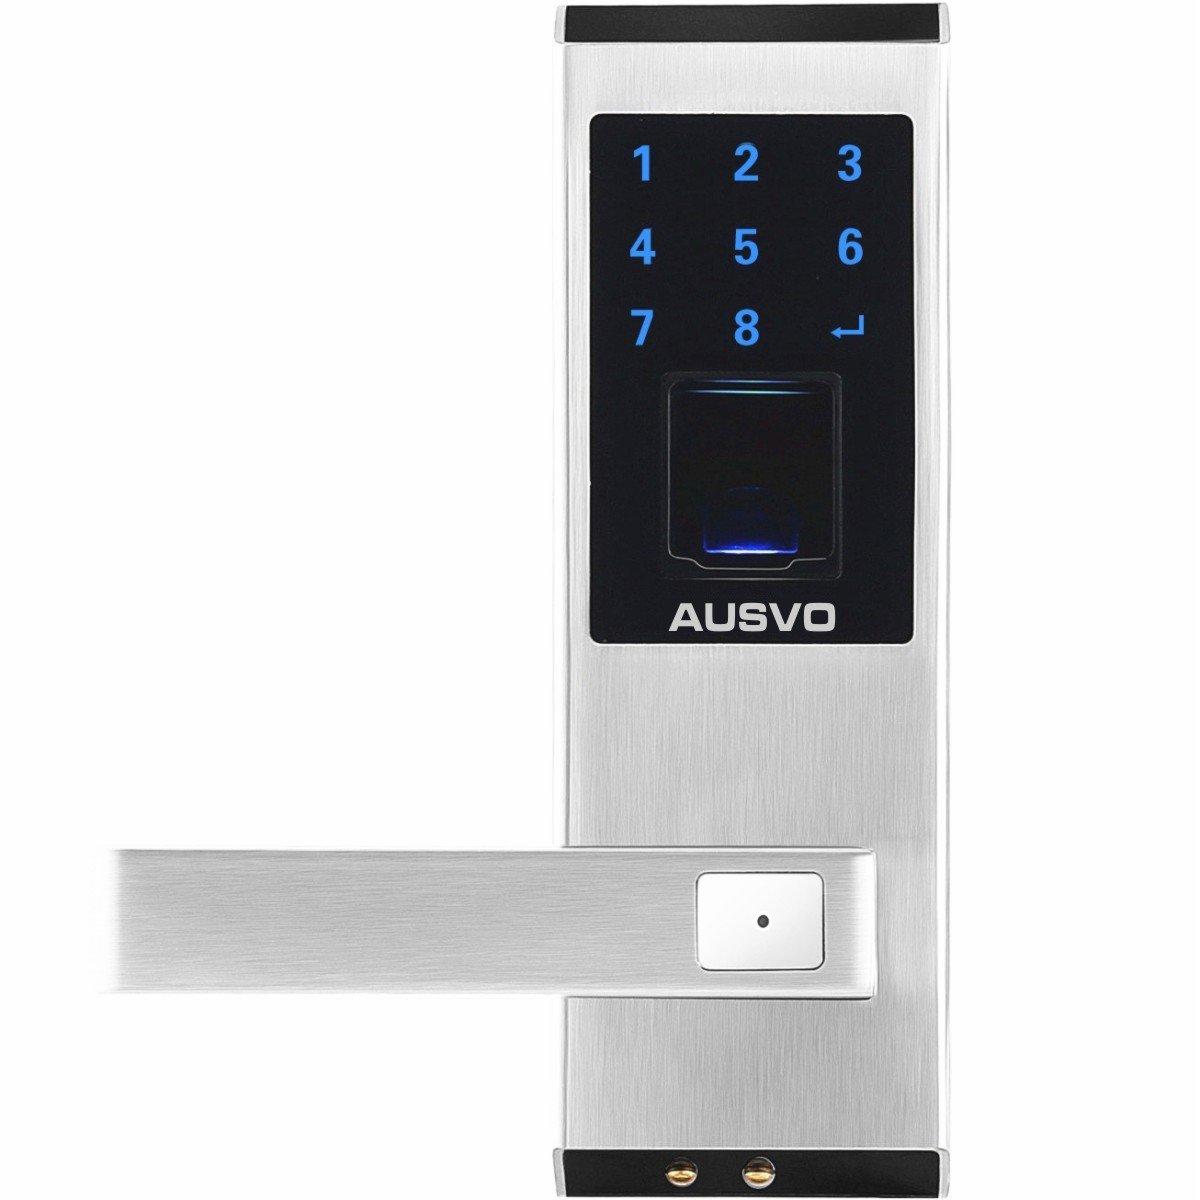 AUSVO M400-L Fingerprint Door Lock Biometric Smart Keyless Digital Touchscreen Keypad Lever Lockset with Knob Handle Stainless Steel Left-Handed